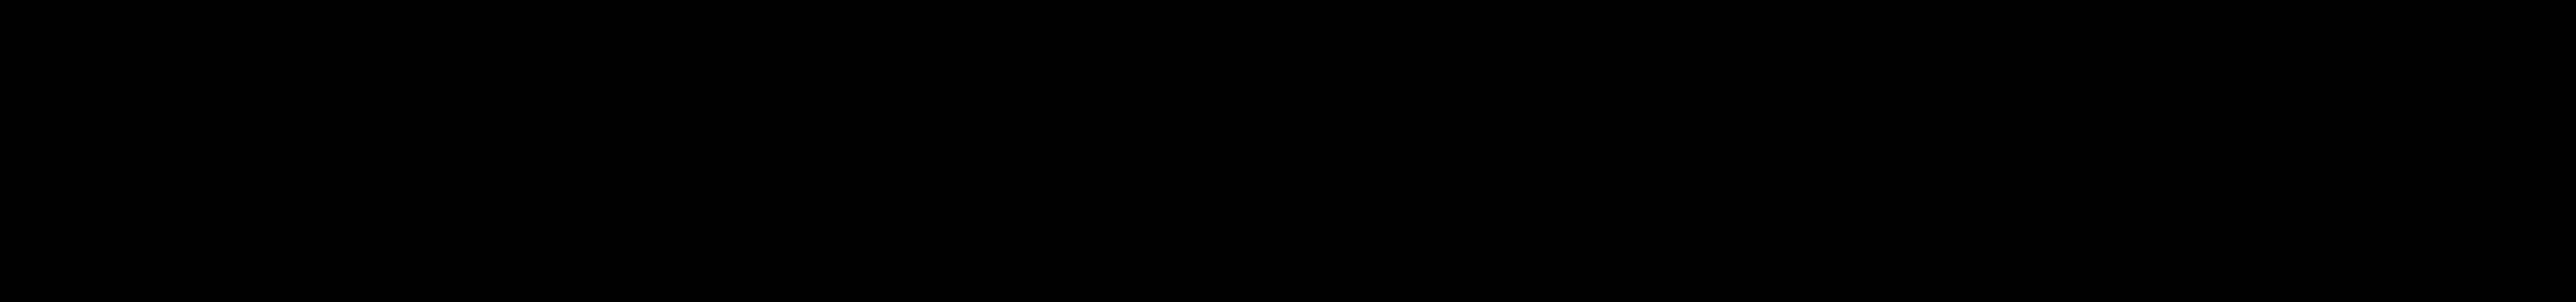 bellator logo 6 - Bellator MMA Logo